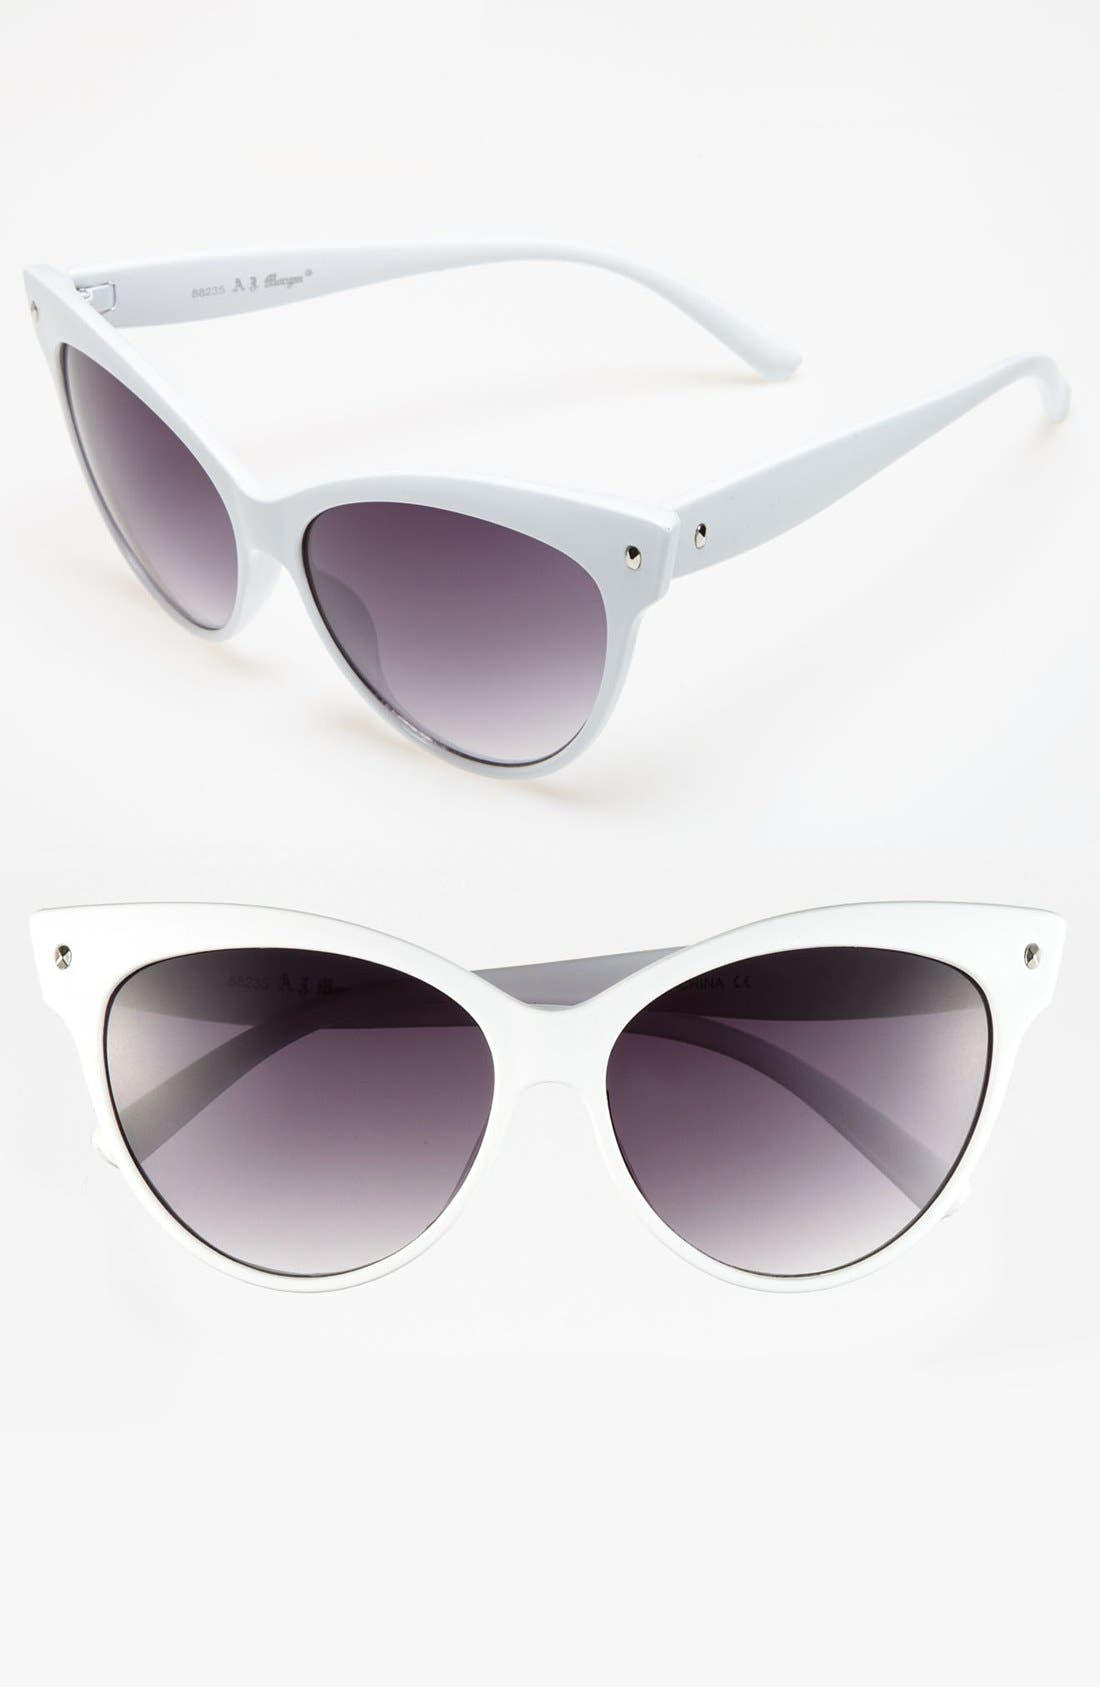 Alternate Image 1 Selected - A.J. Morgan 58mm 'Contessa' Sunglasses